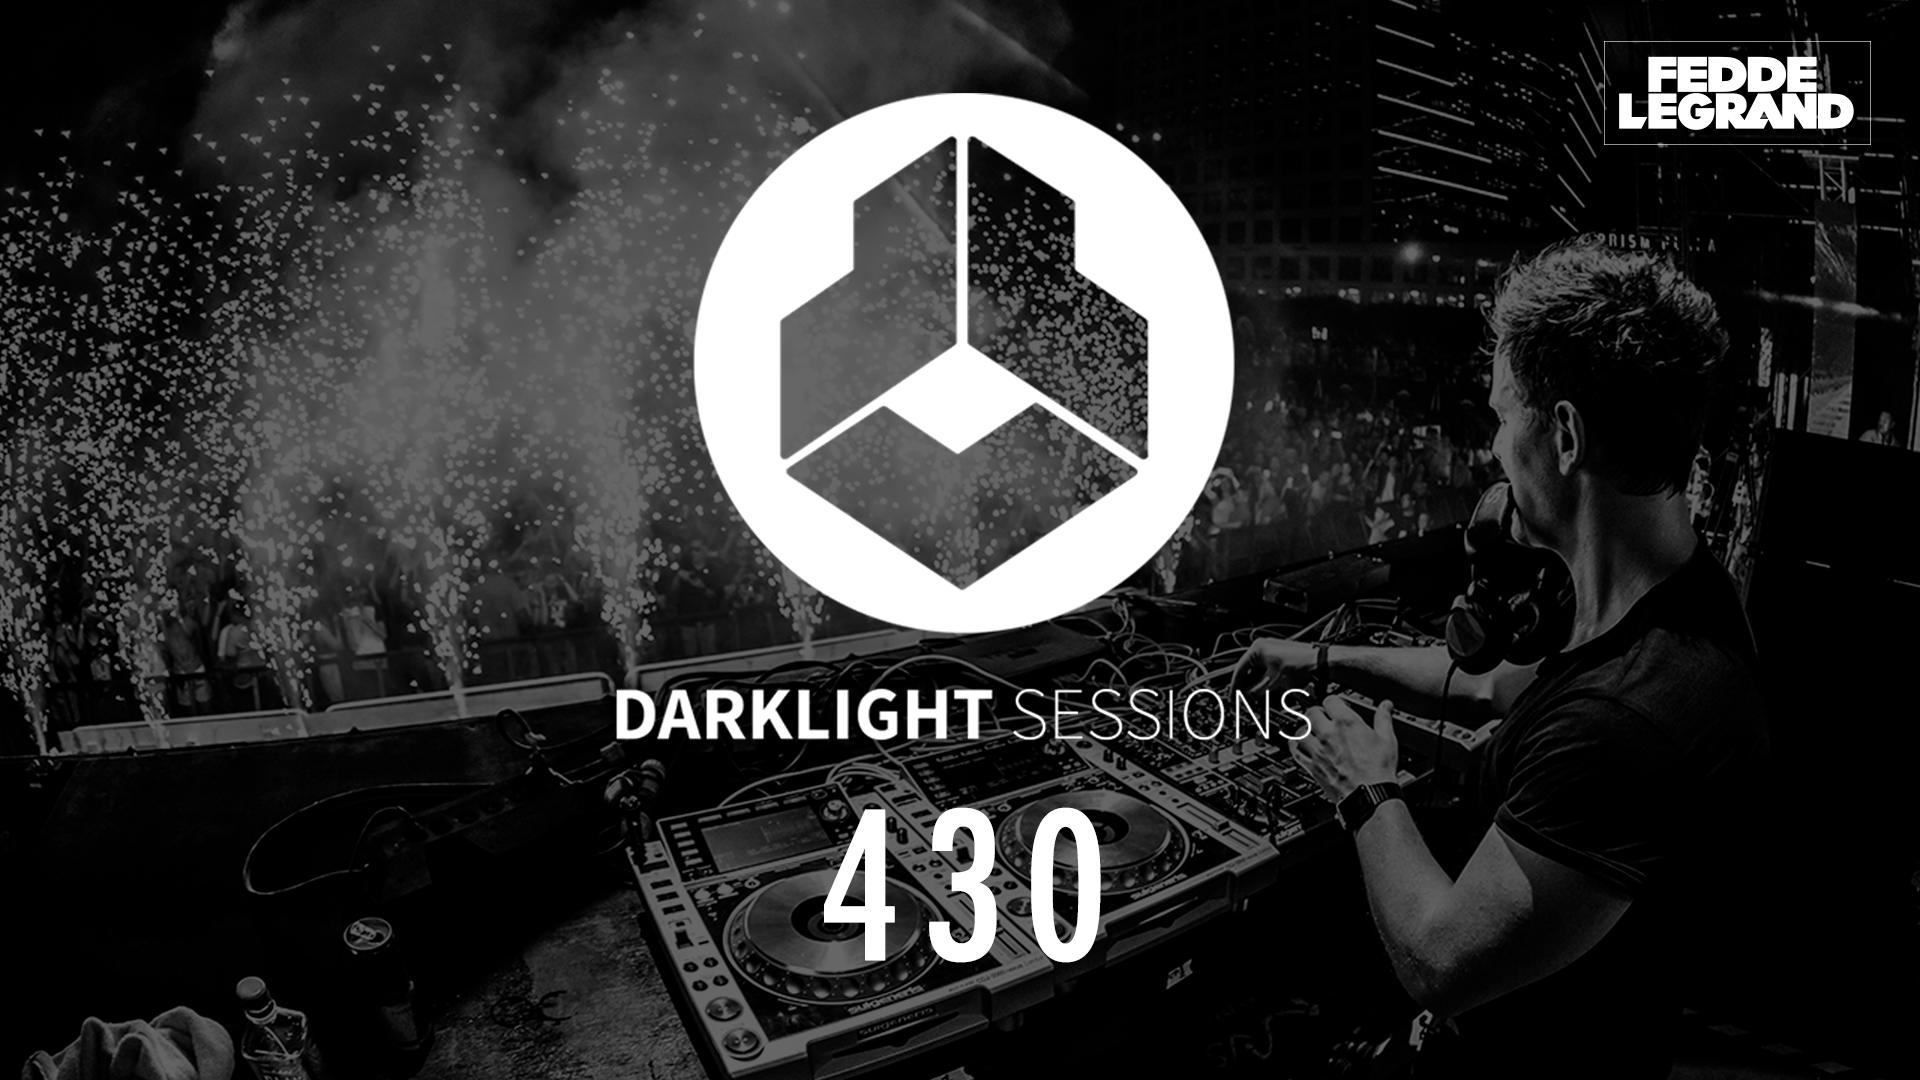 Darklight Sessions 430